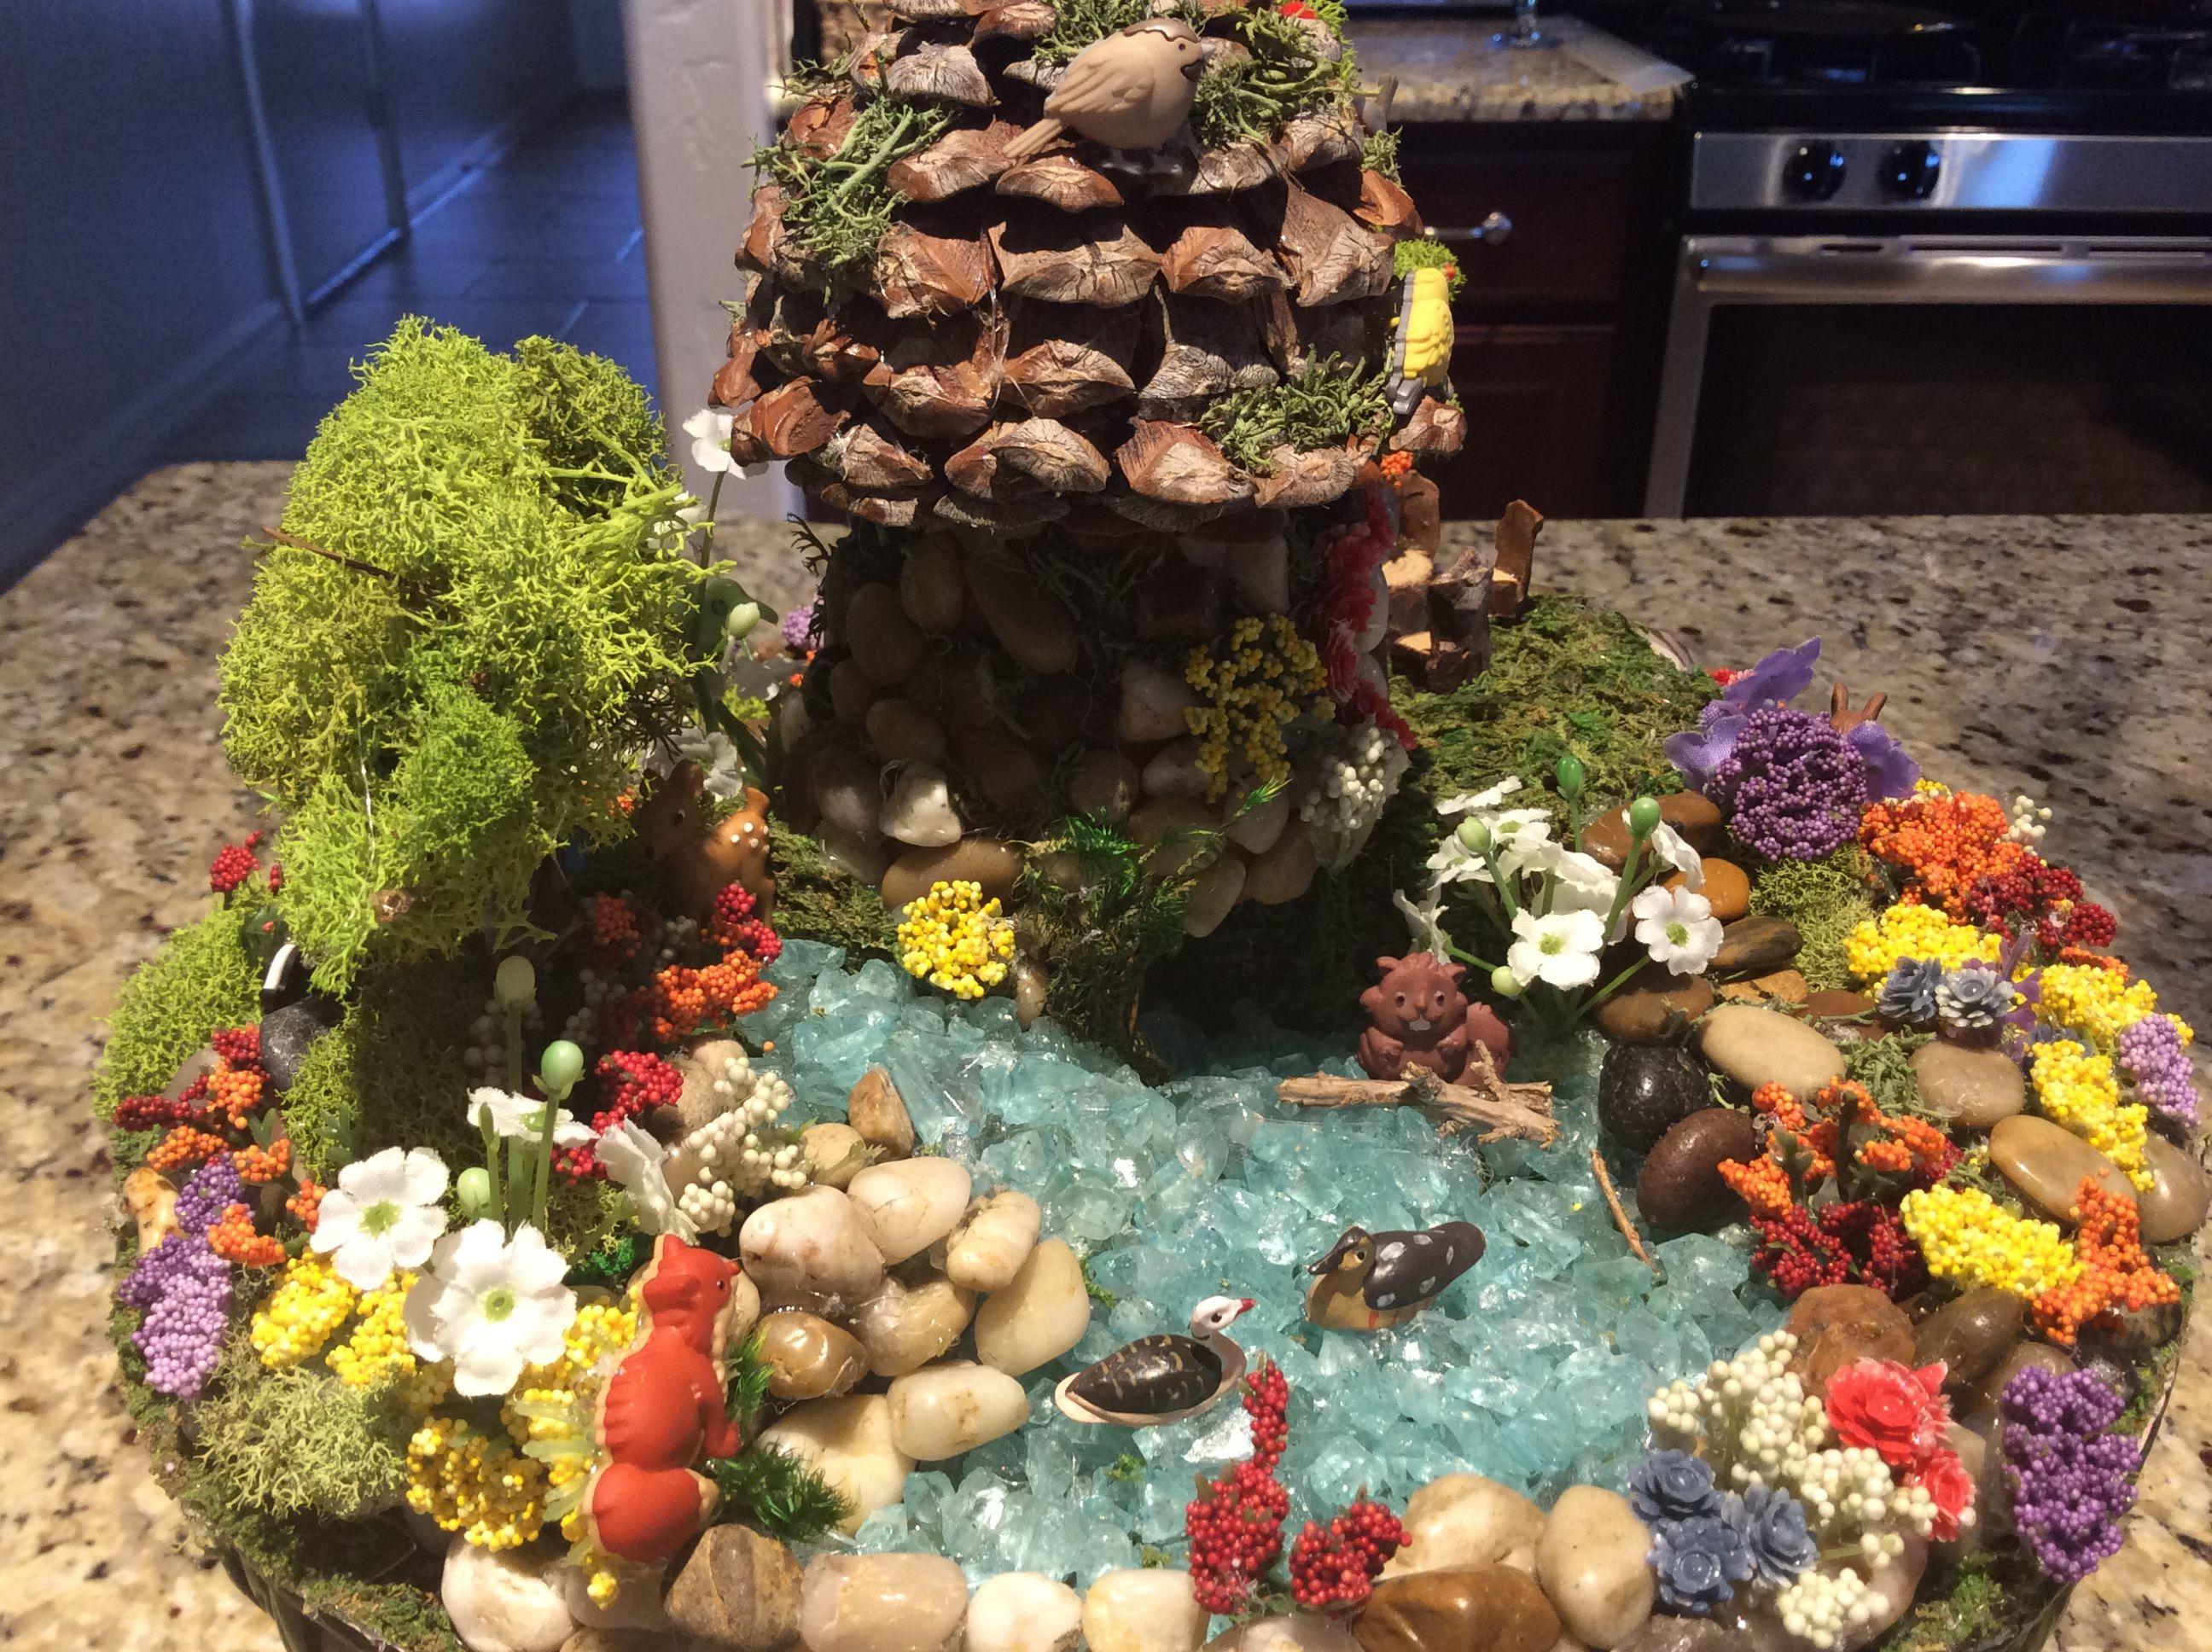 Mini #forest #garden #nature | Miniature figurines | Pinterest